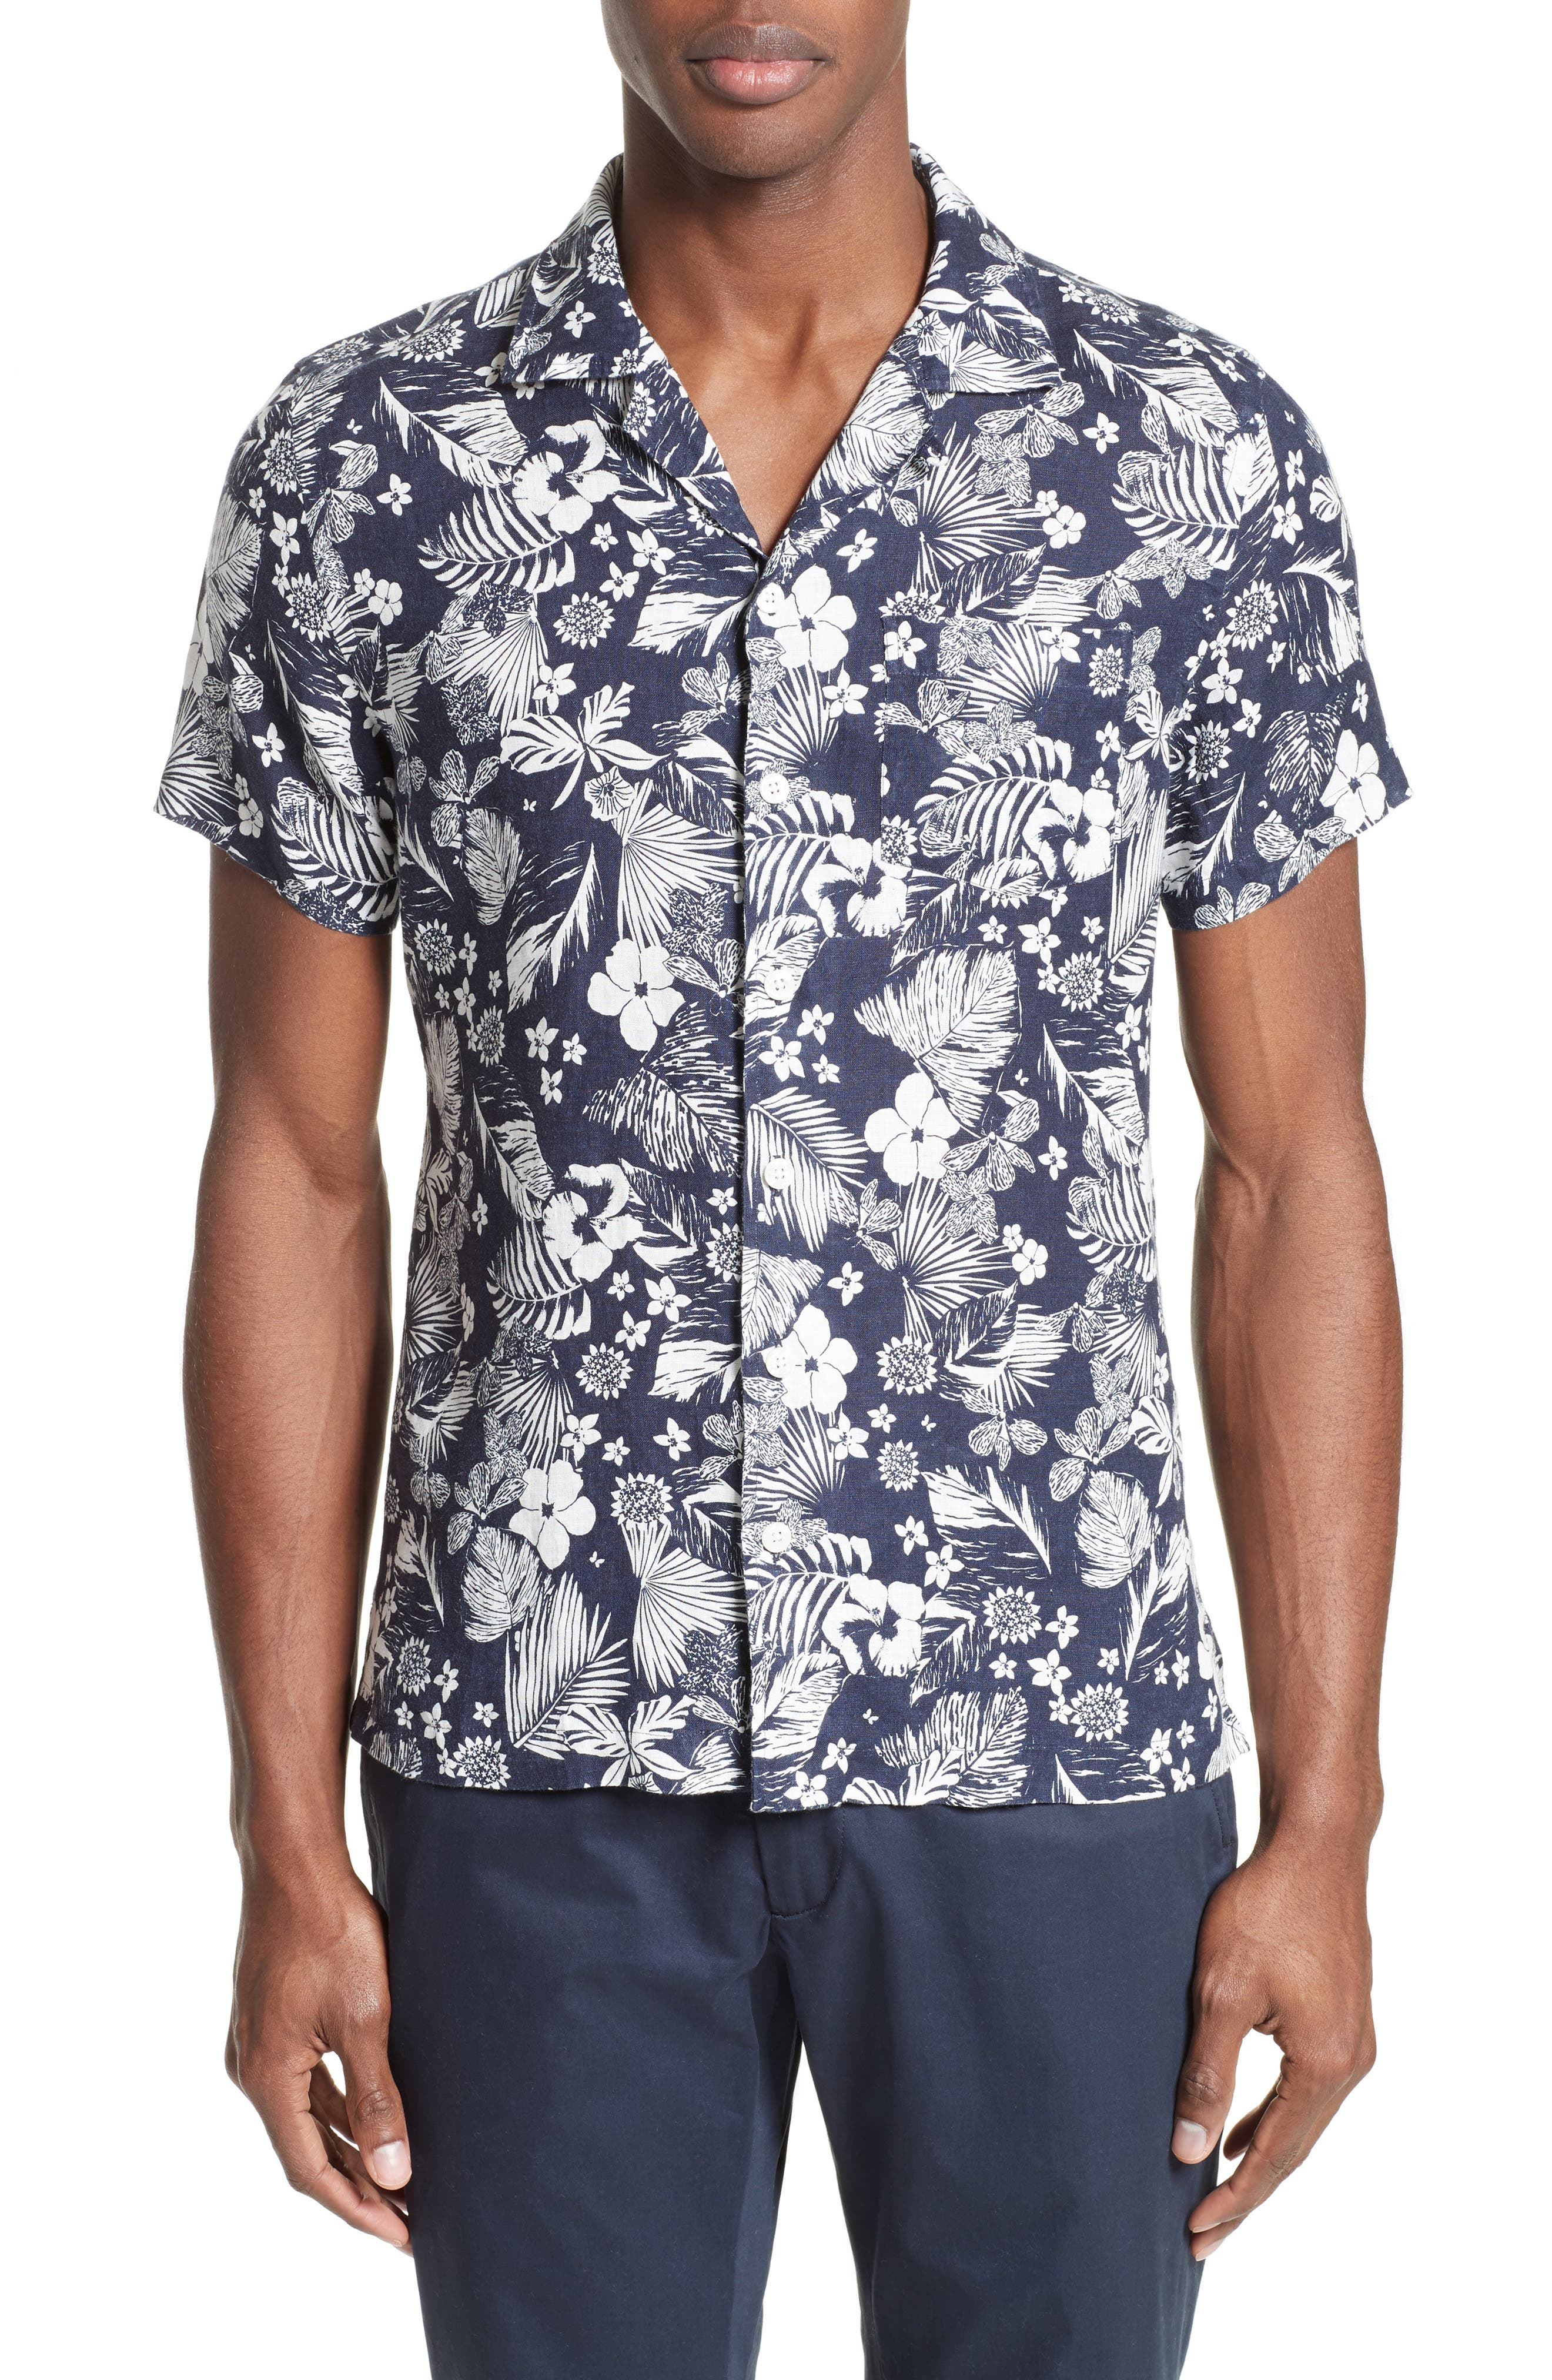 Main Image - Todd Snyder Trim Fit Floral Print Linen Camp Shirt